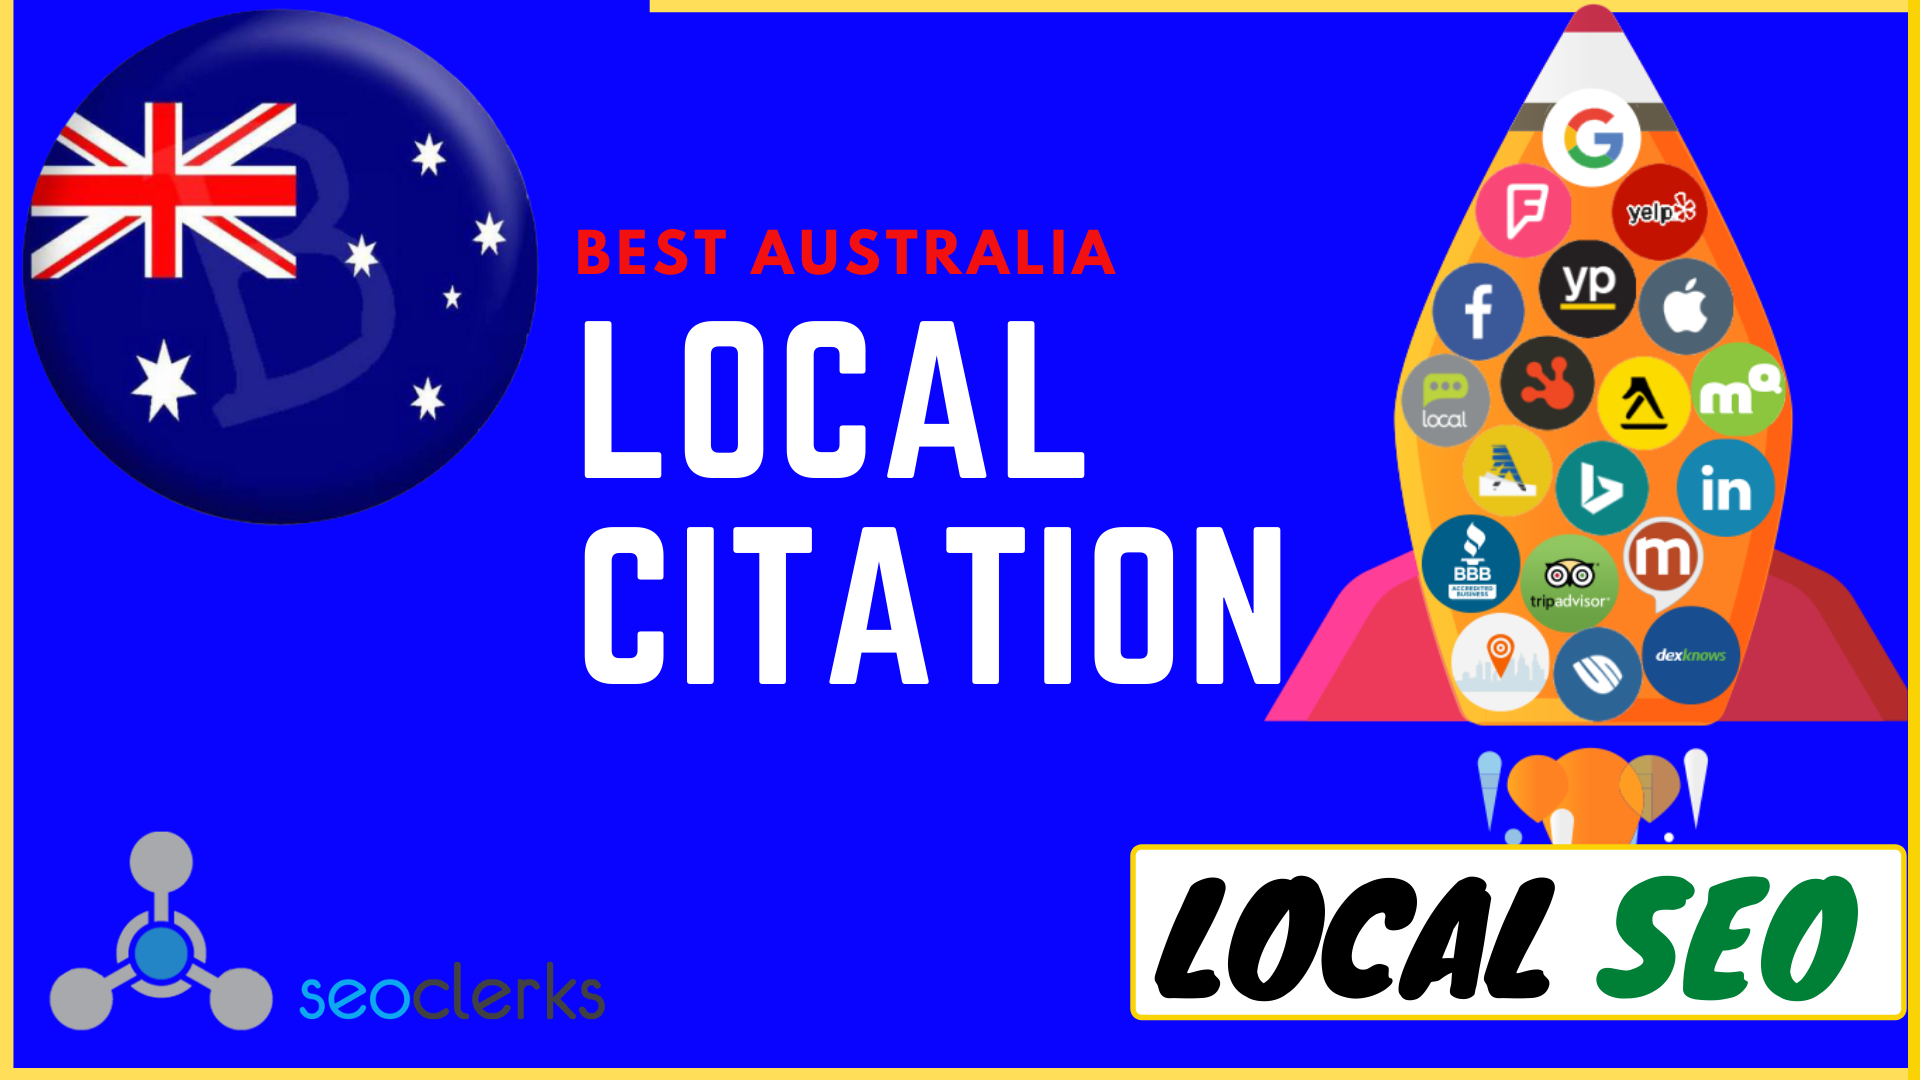 I will create 25 best australia local citations